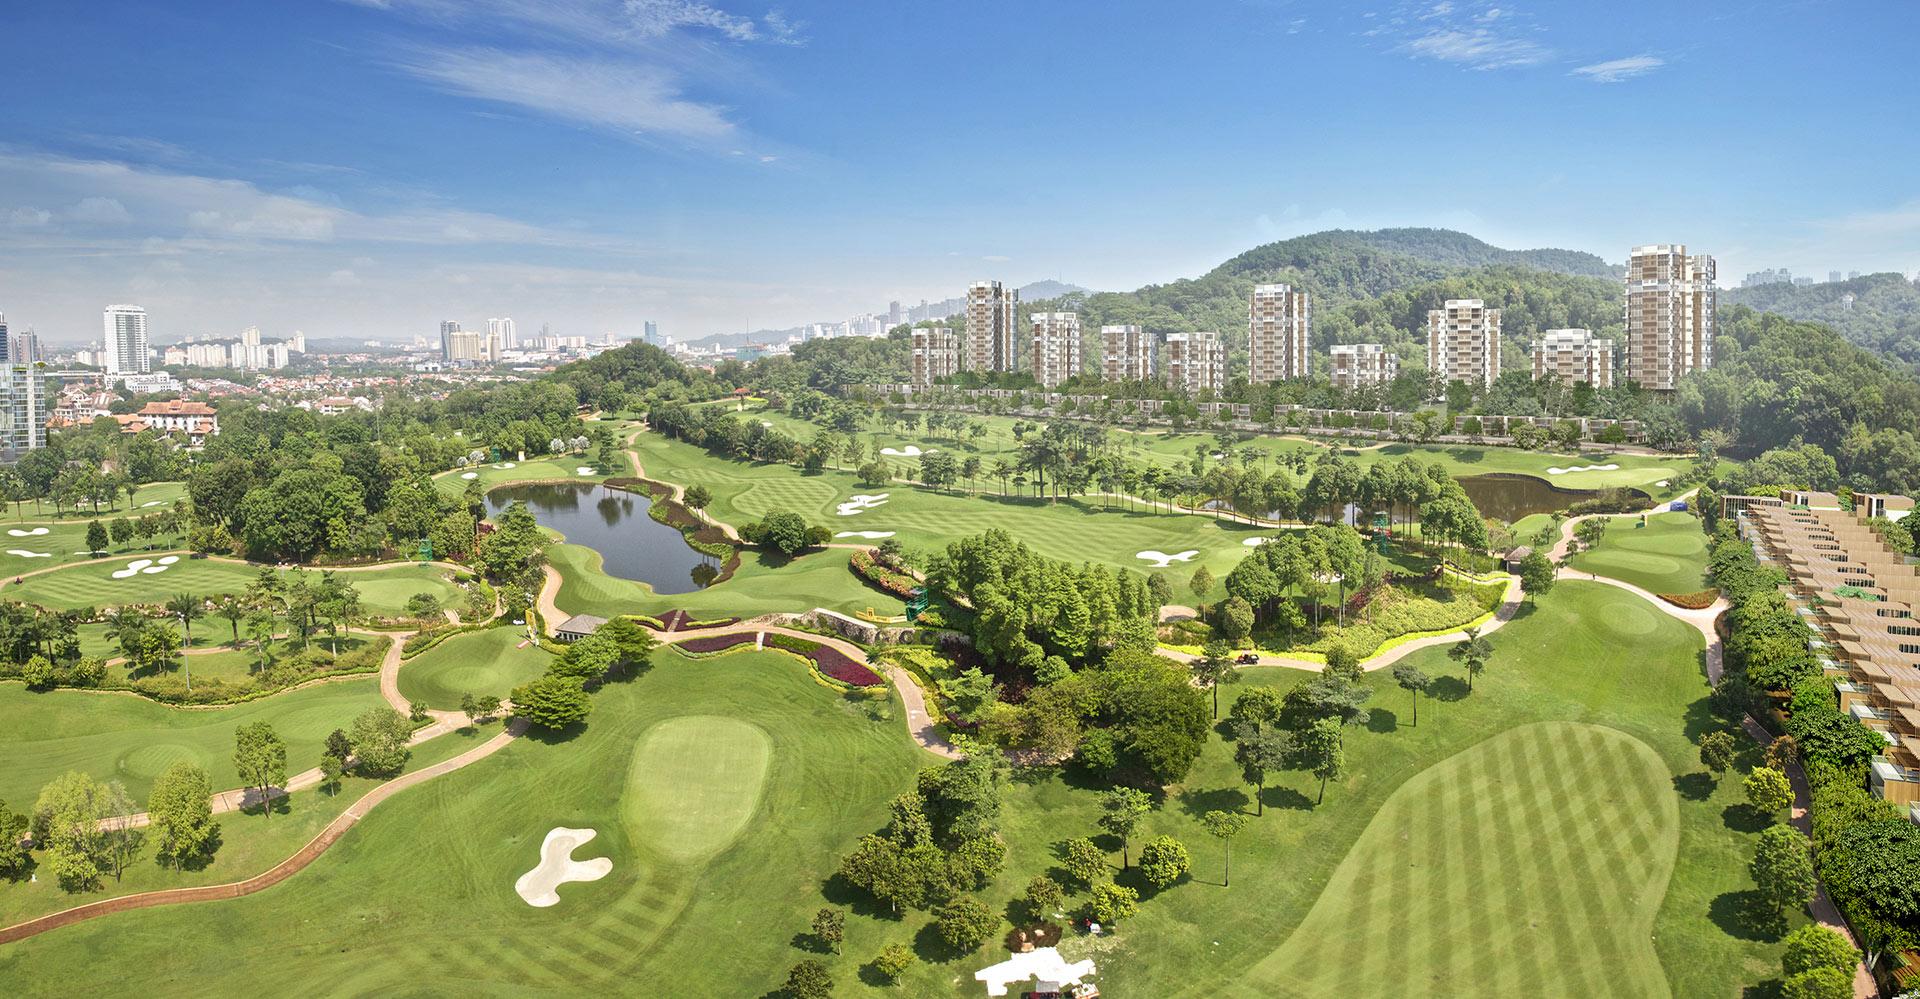 KLGCC Urban Resort Golf - Iskandar Malaysia WATG TOP FLOOR Hole 8 view